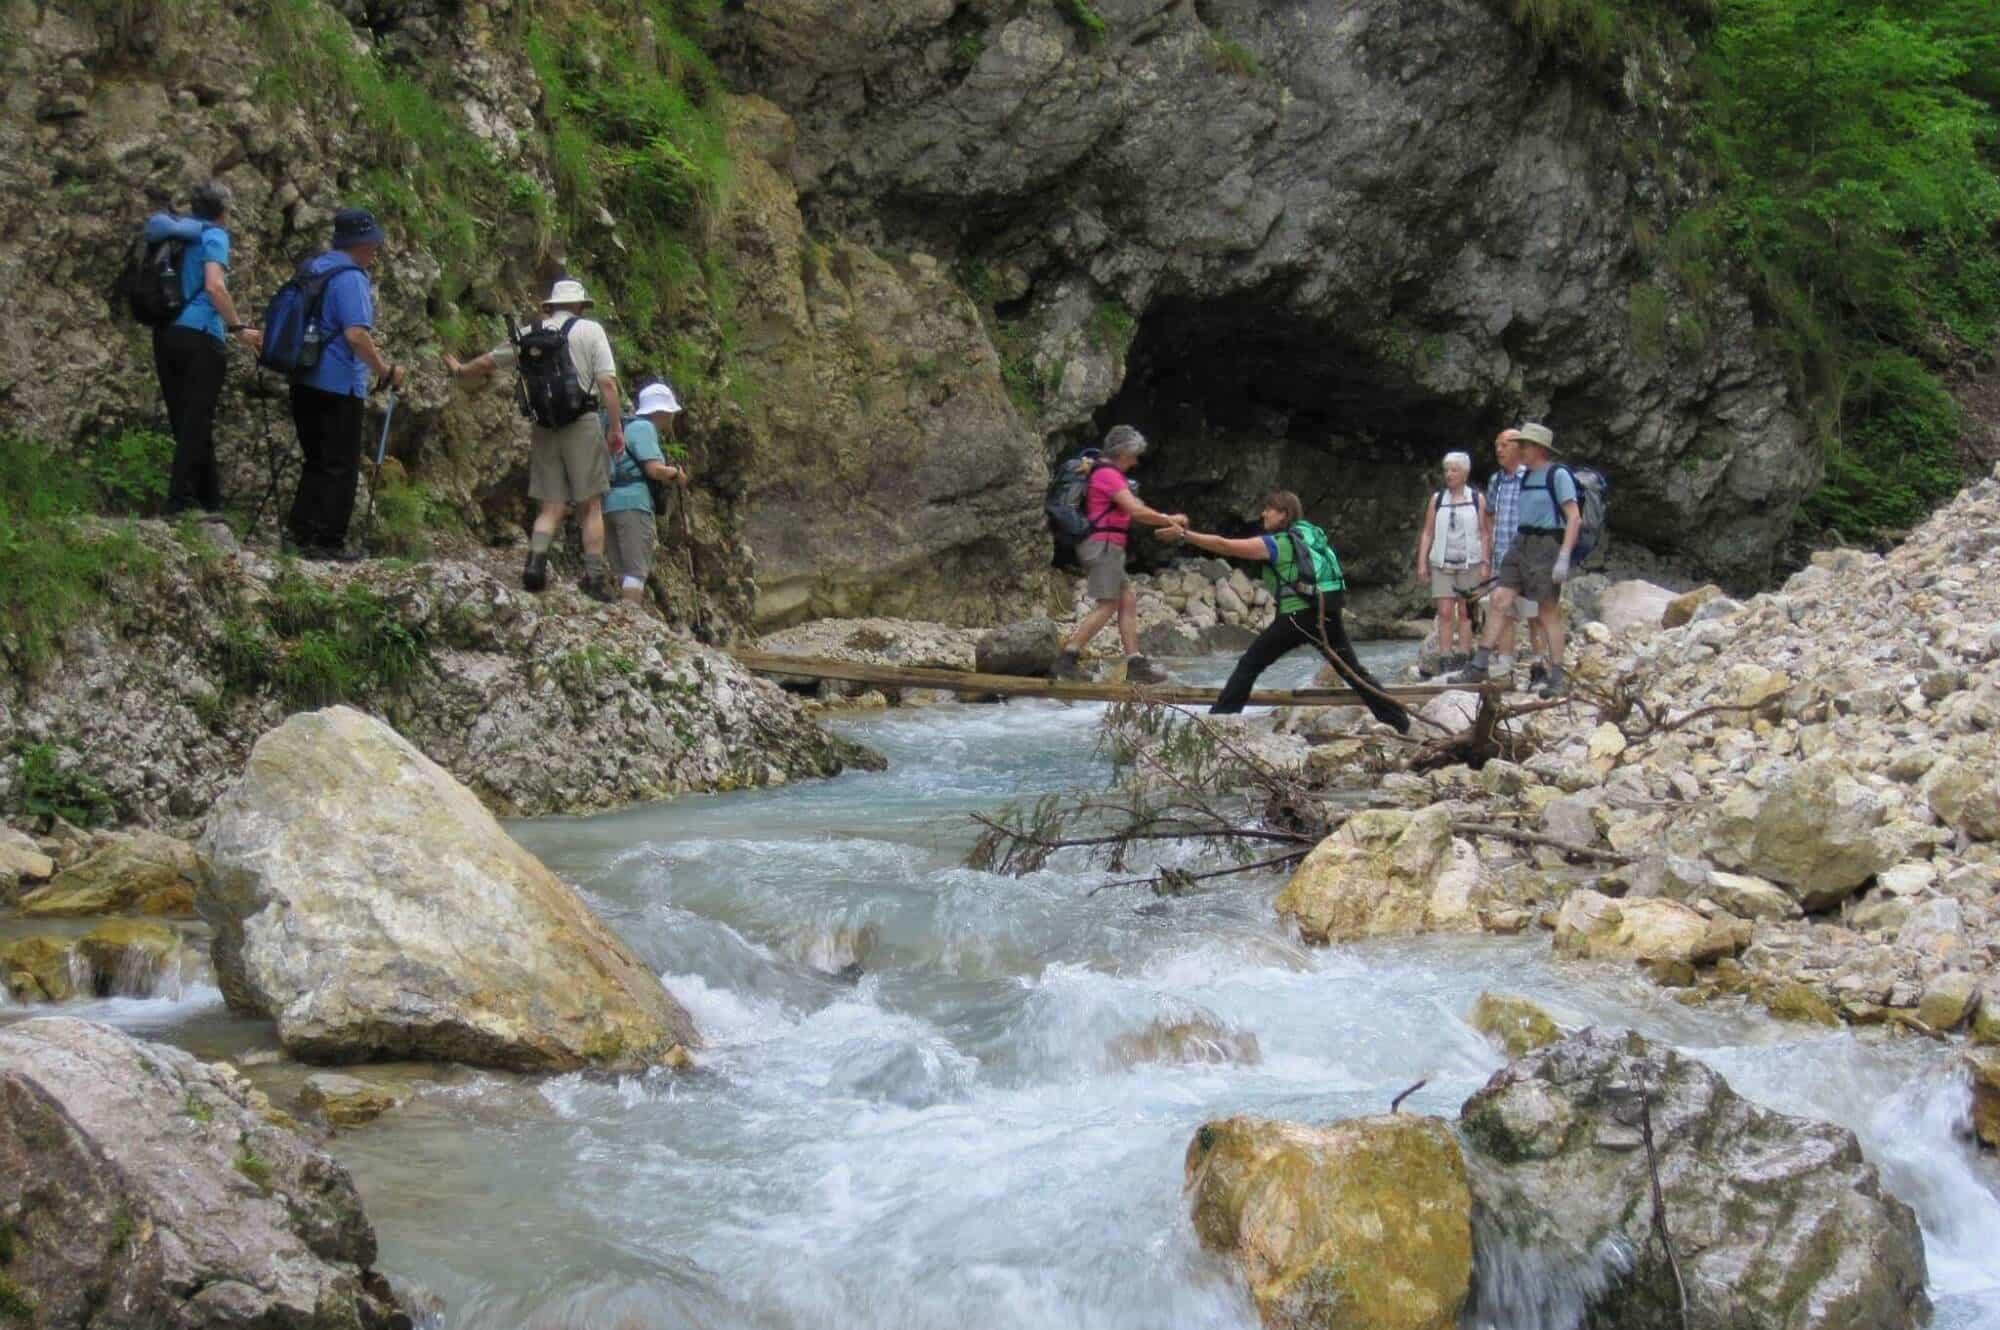 Crossing Martuljek River, Slovenia